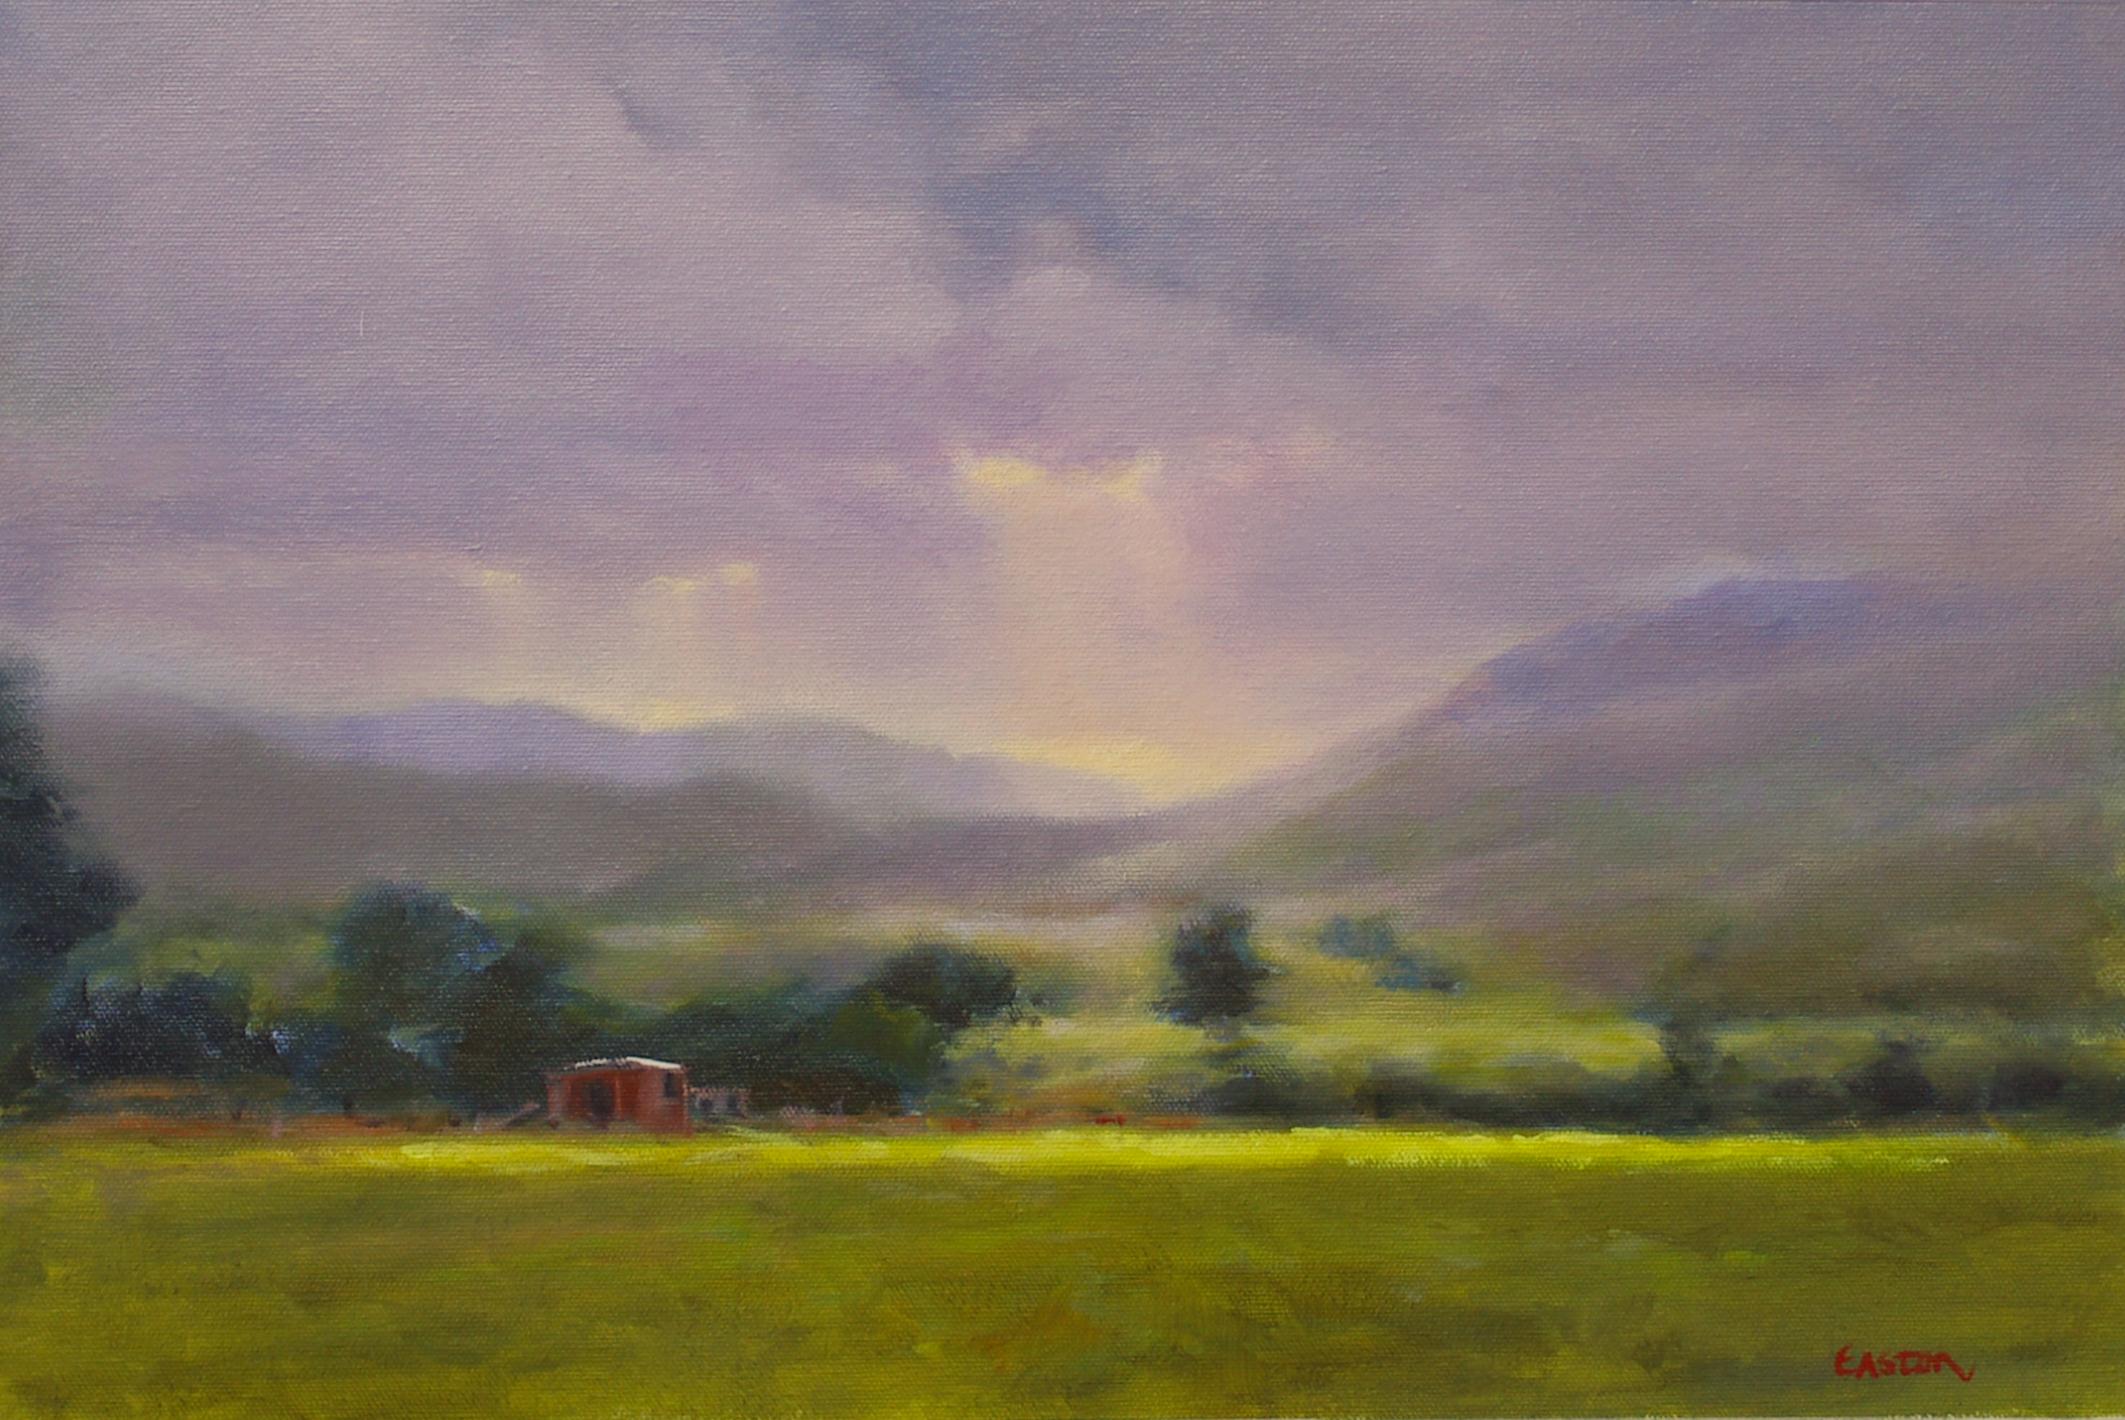 Sunlight breaking through onto hill country farmland